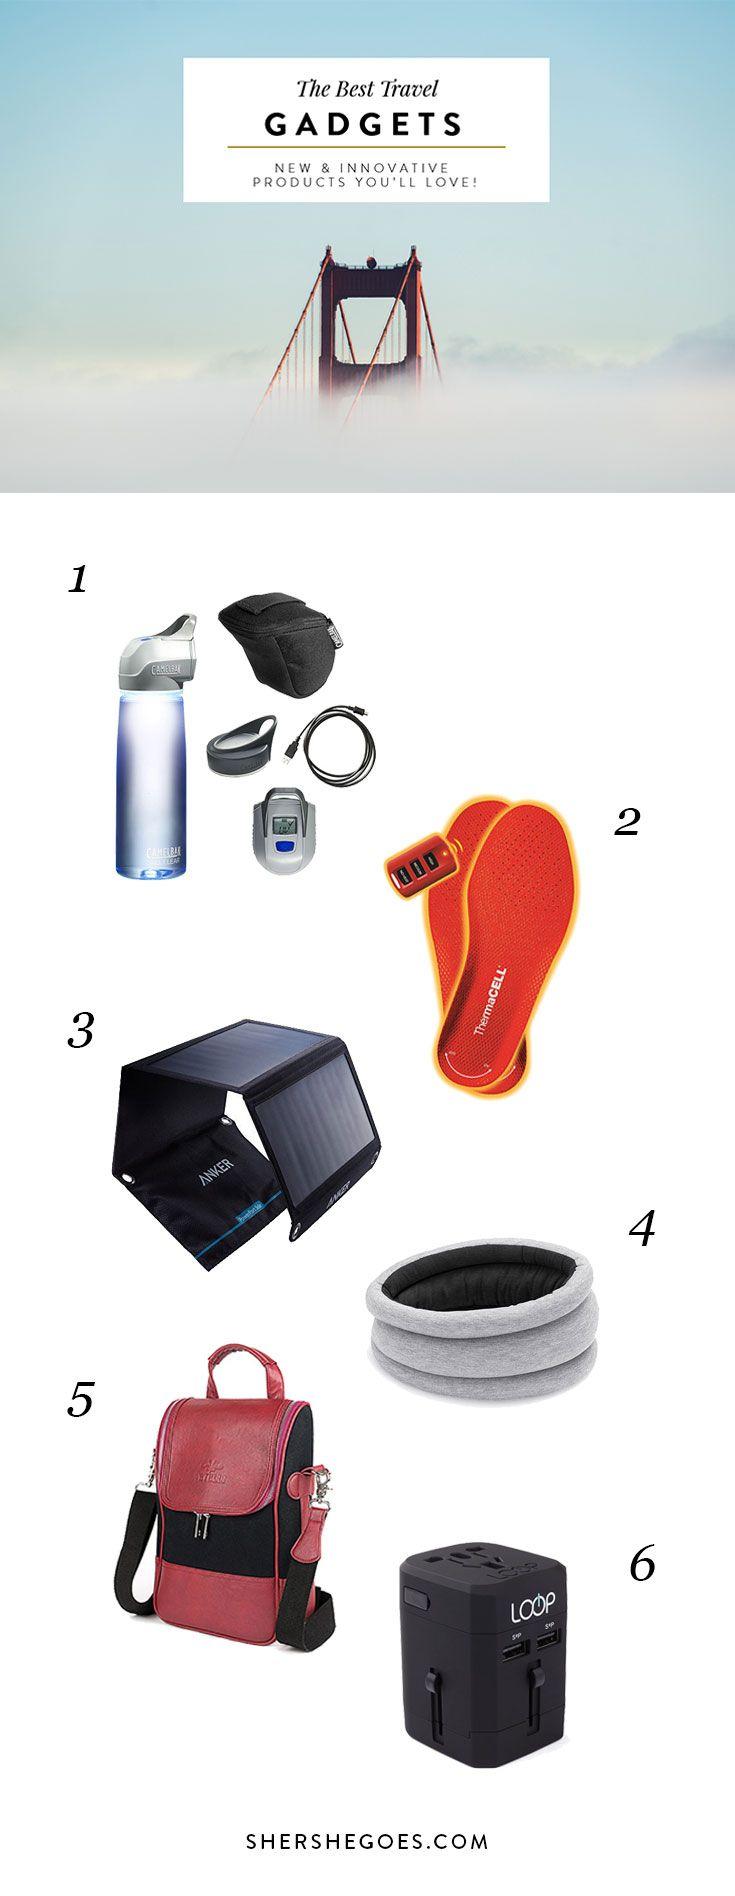 best travel gadgets, best travel gadgets tech, best travel accessories, best travel accessories for men and women, carry on bag essentials, carry on bag essentials airplane, travel must haves, travel checklist, packing checklist